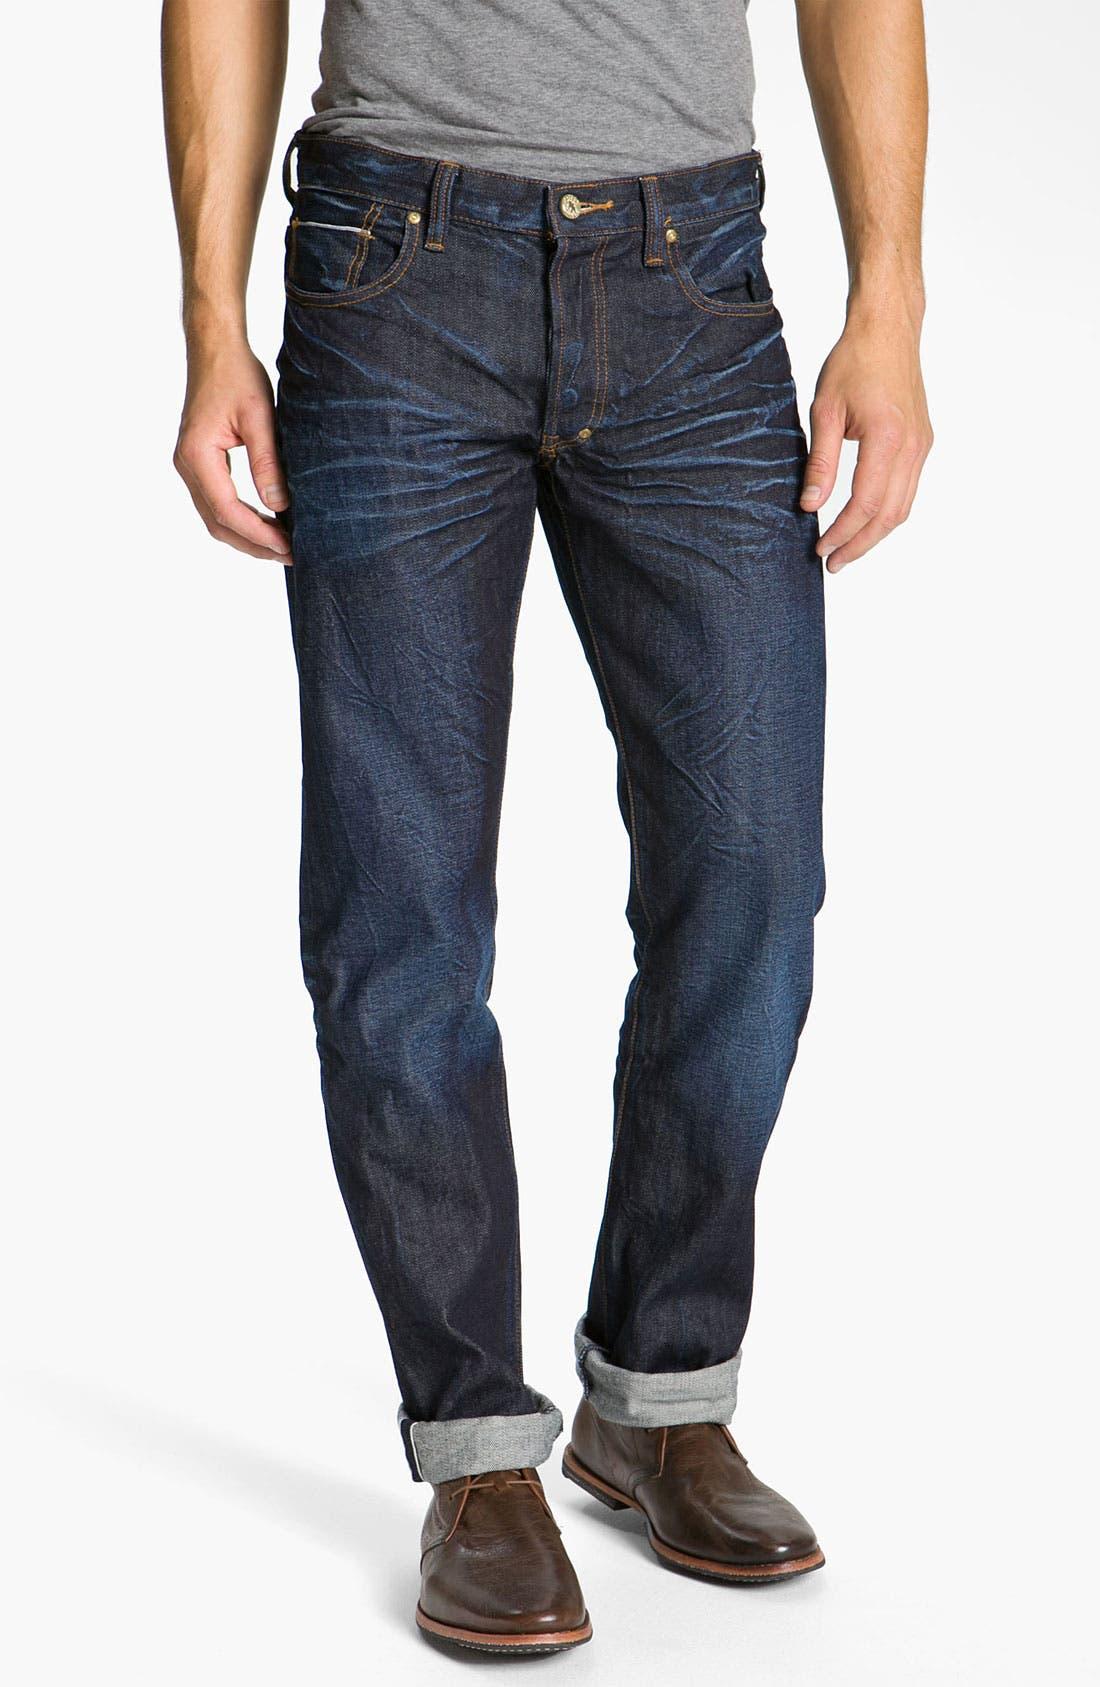 Alternate Image 2  - PRPS 'Snowy Crevasses Barracuda' Straight Leg Jeans (1 Year Wash)